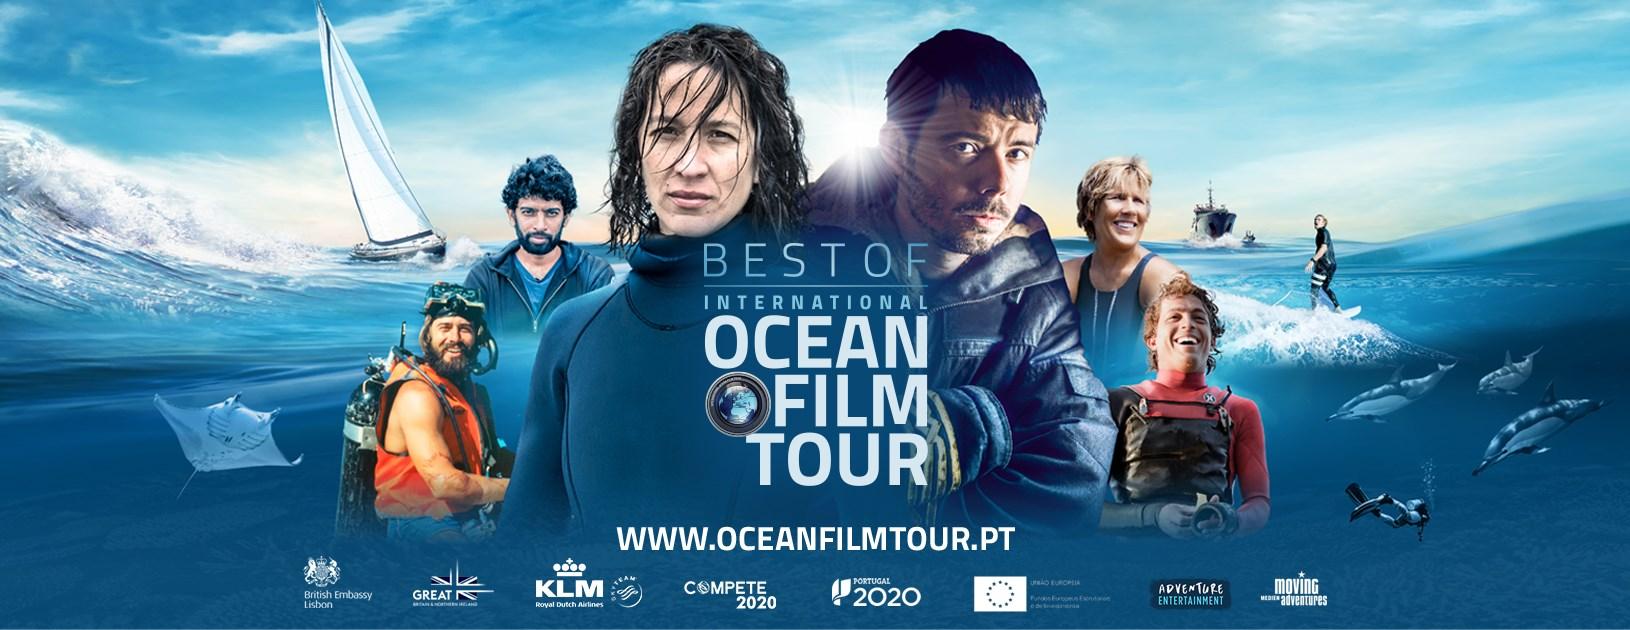 International Ocean Film Tour Best of - Lisboa